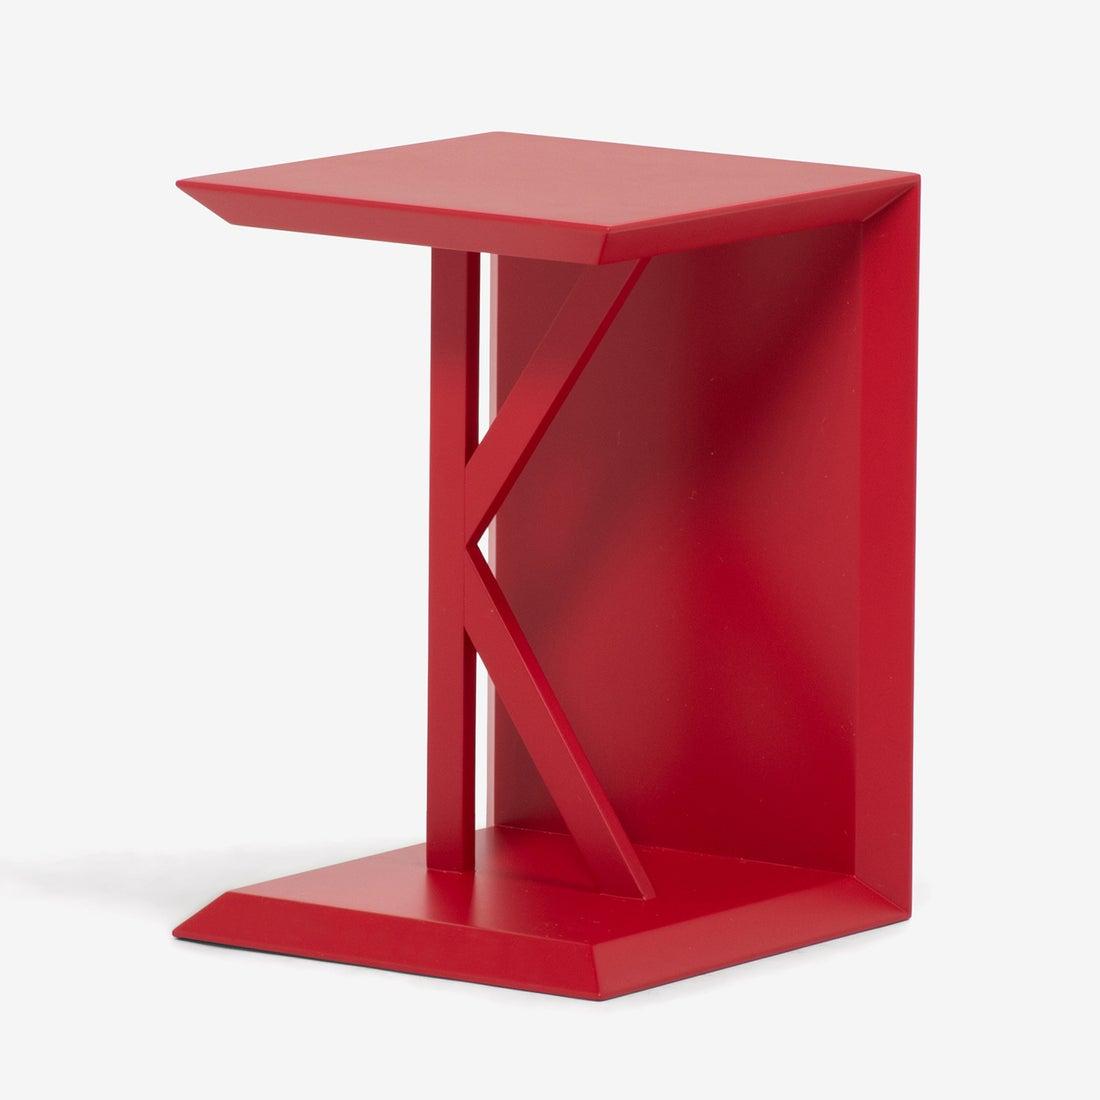 IDC OTSUKA/大塚家具 サイドテーブル K1 レッド (レッド)